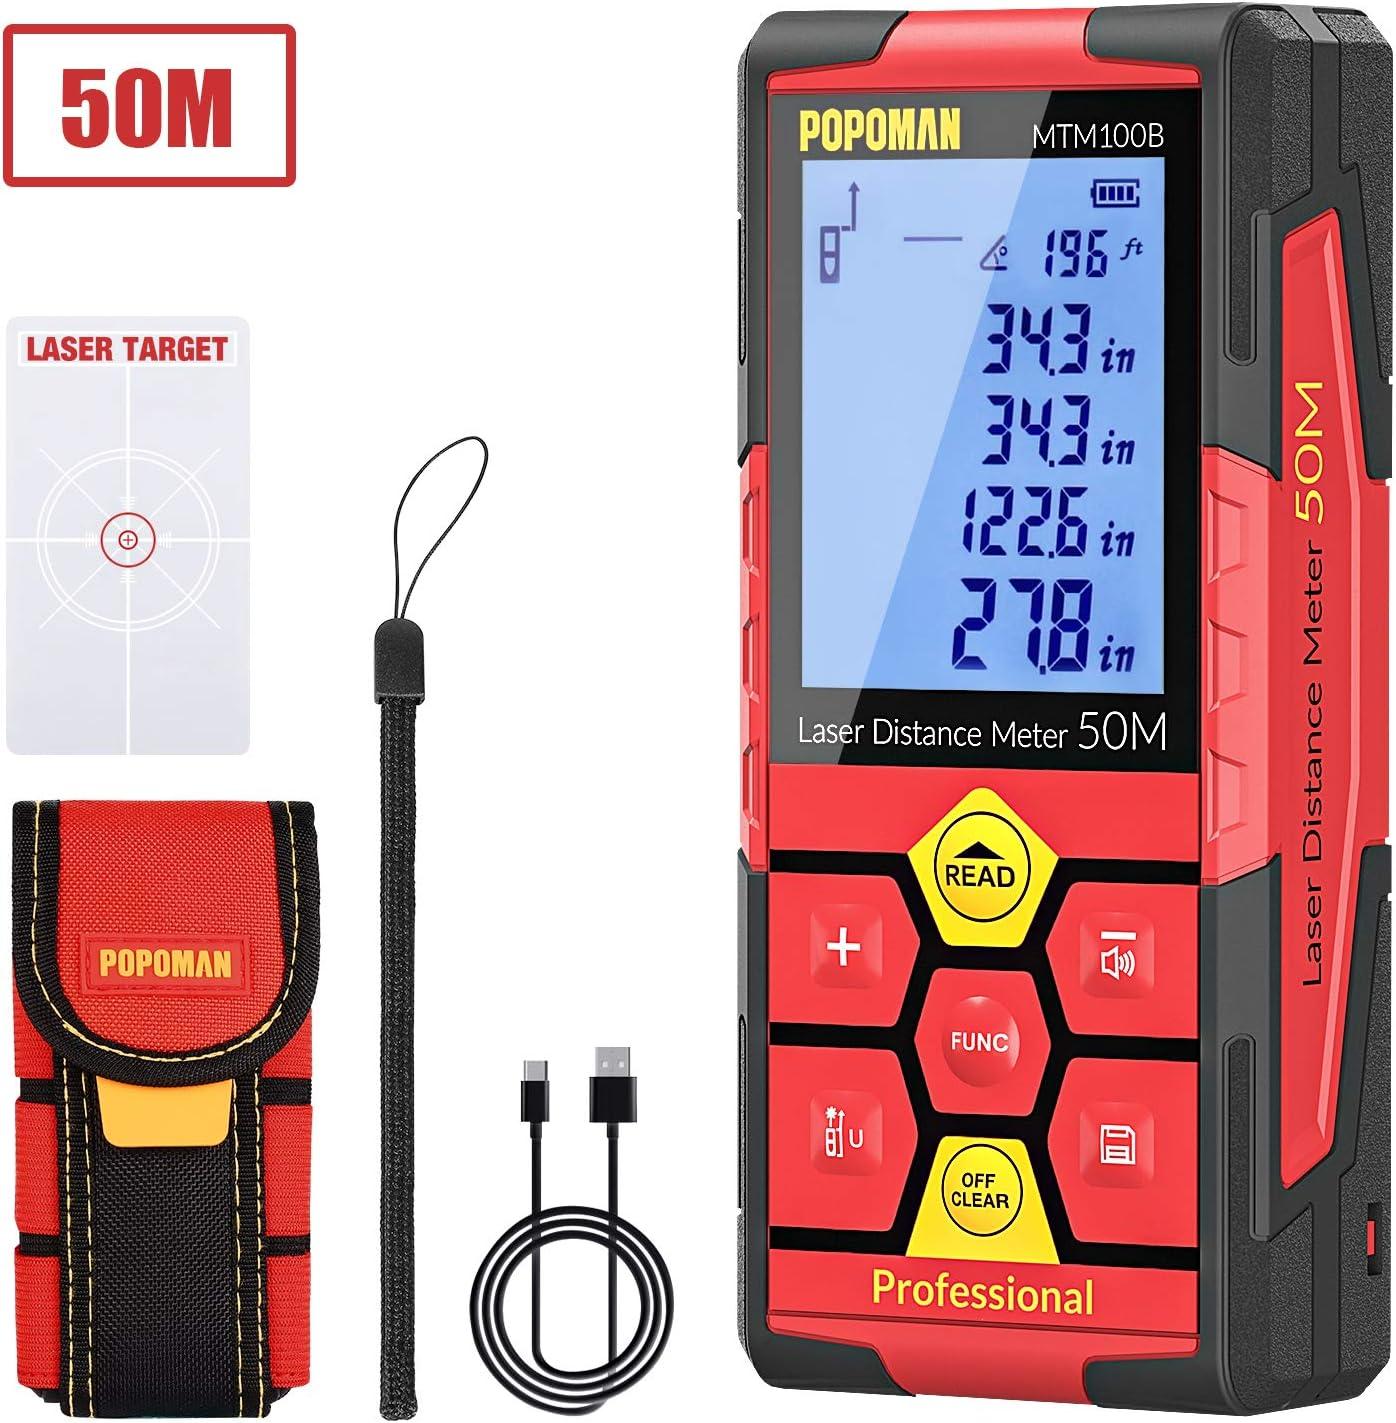 POPOMAN Telémetro láser 50m, USB Carga 30mins, Decoracion interior, 99 Datos, Medidor Láser, Sensor de Ángulo Electrónico, 2.25'' LCD Pantalla, m/in/ft/ft+in, Pitagórico, Distancia, Volumen-MTM100B